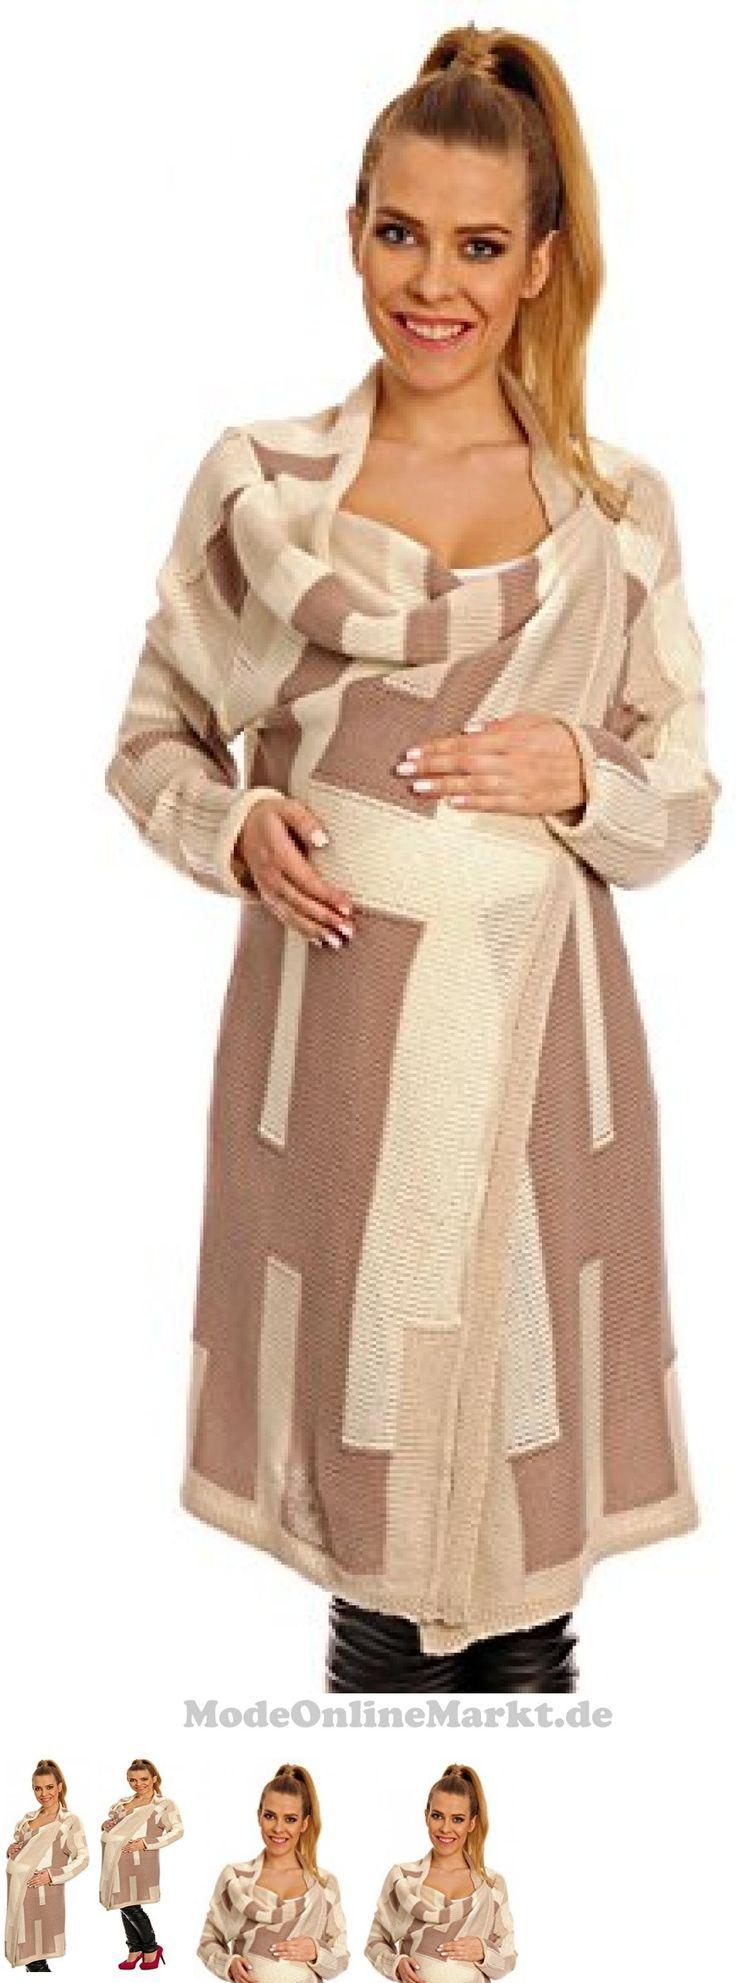 #Happy #Mama #Damen # #8211 #Umstands #Stretch #Strickjacke #Wasserfall #Jacke #Blazer #277p #Beige #Farbblock #38 #42 #7736797